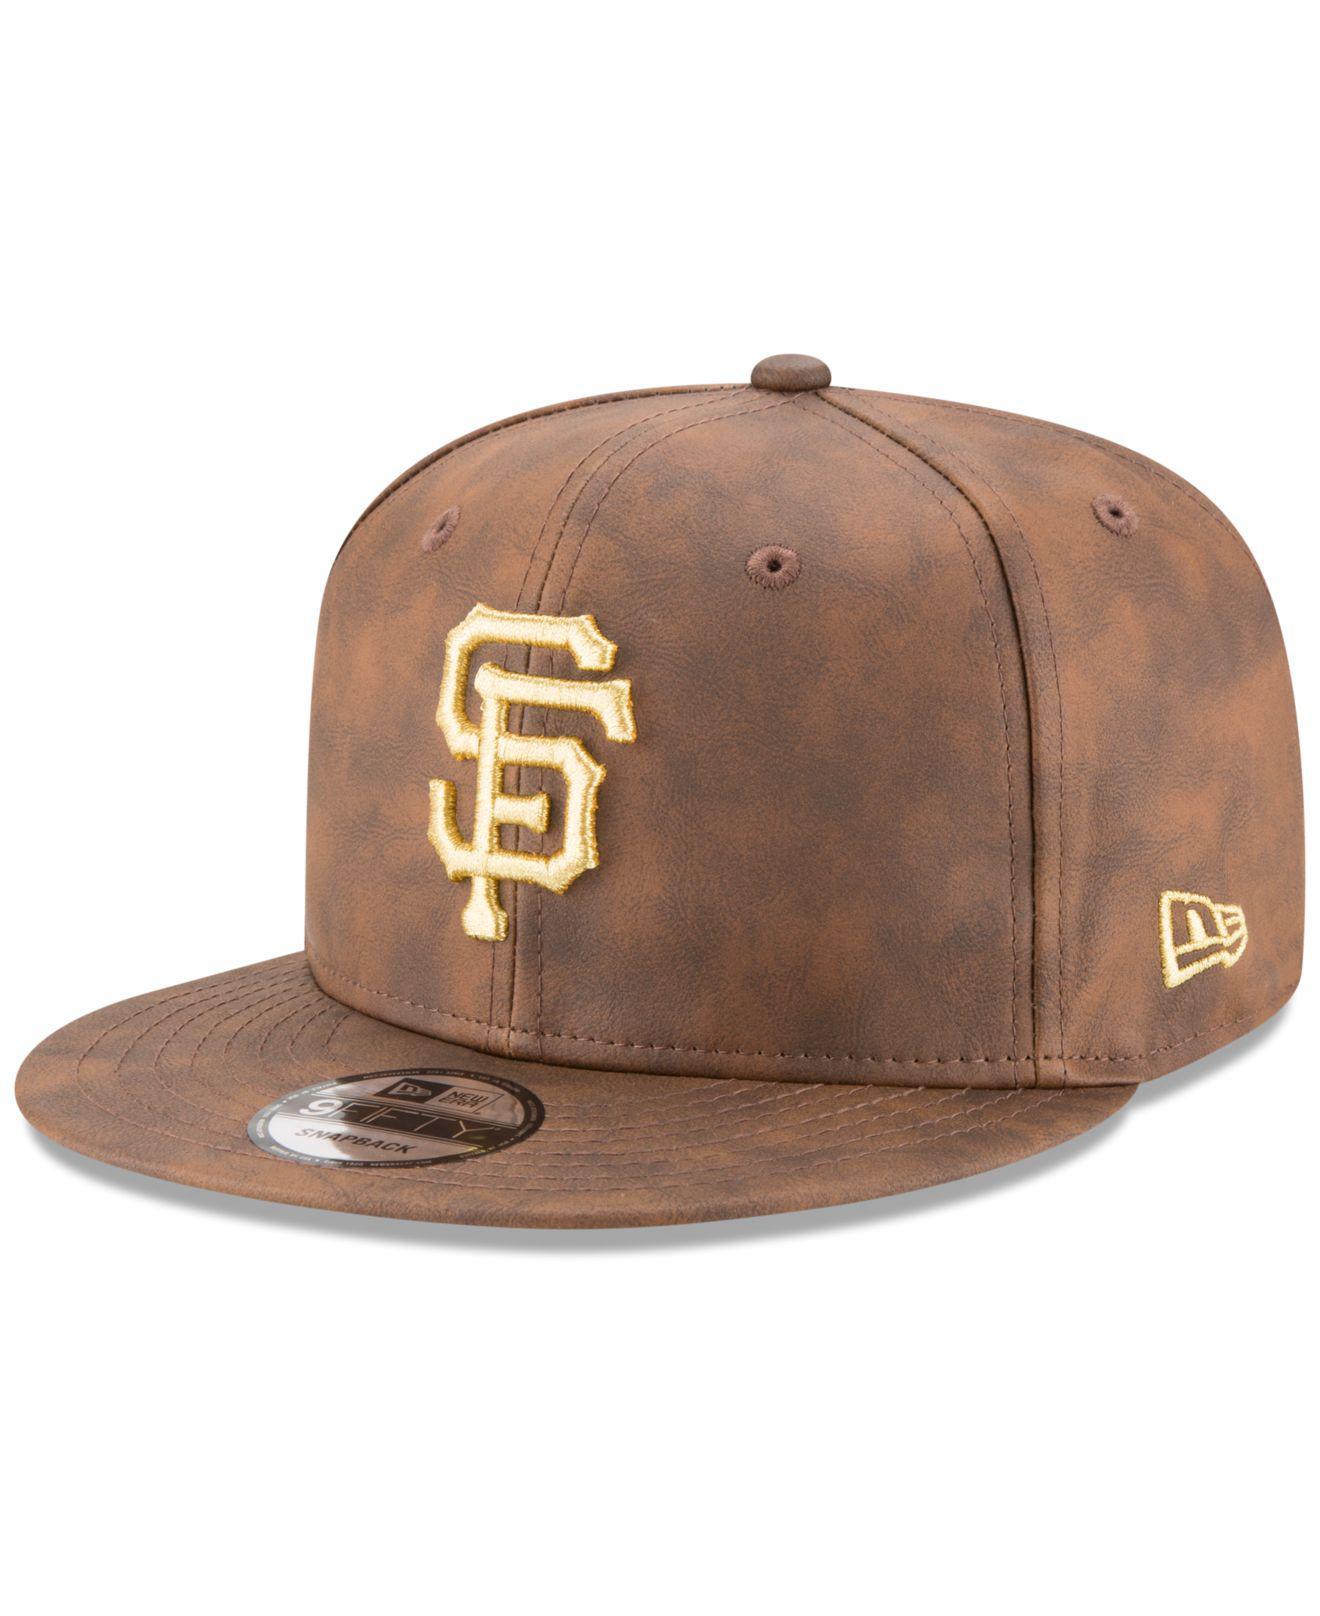 wholesale dealer 44d05 af20c Lyst - KTZ San Francisco Giants Butter So Soft Faux-leather 9fifty ...